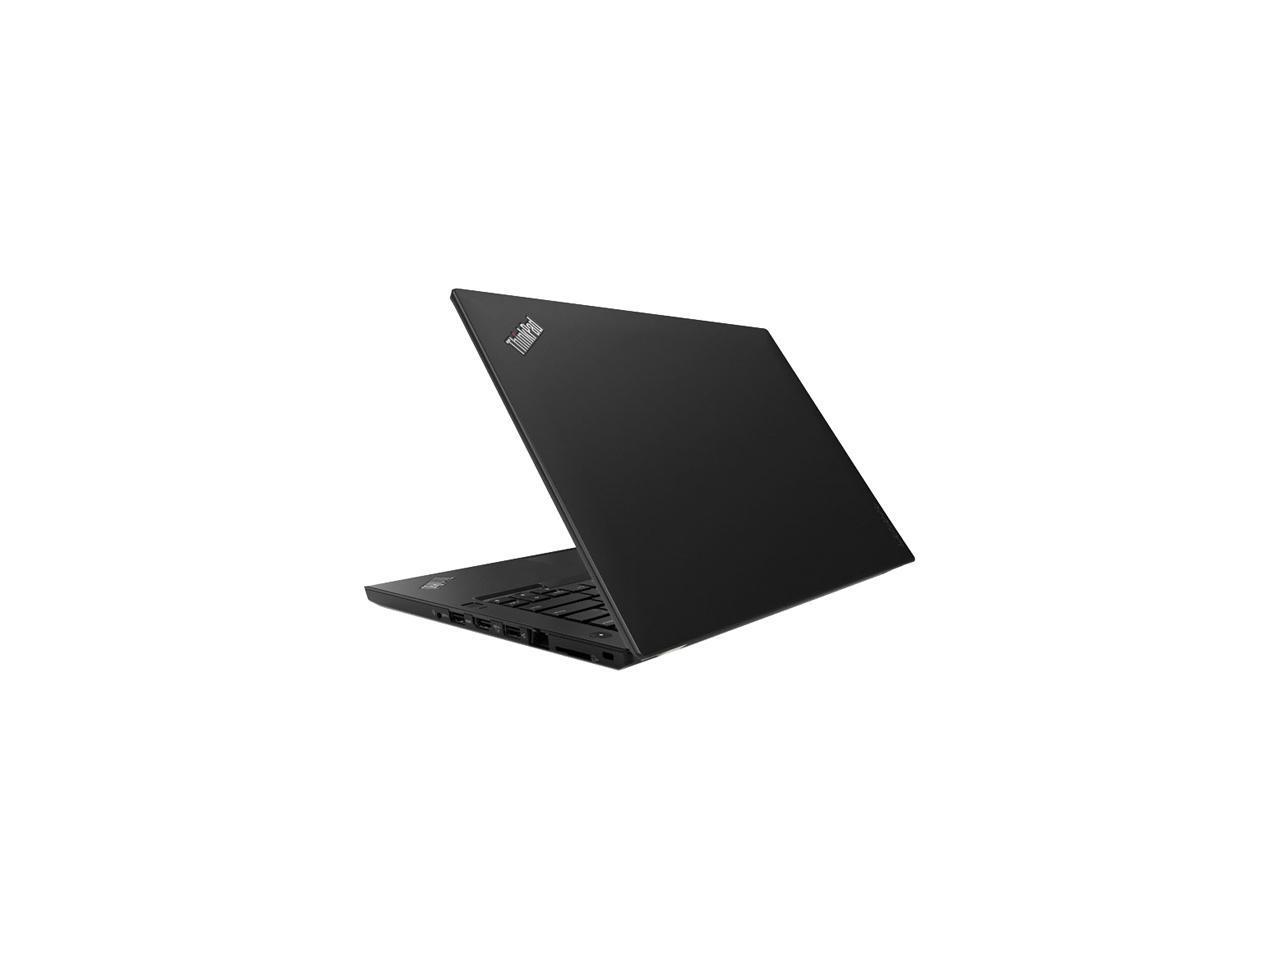 "LENOVO THINKPAD ULTRABOOK X1 CARBON 20KG0022US 8Th Gen Intel Corei7,1.8GHz,512GB SSD, 16GB RAM, Webcam,Wlan,bluetooth,Backlit Keyboard,Finger Print, 14"" Non-TouchScreen,Windows 10 Home"